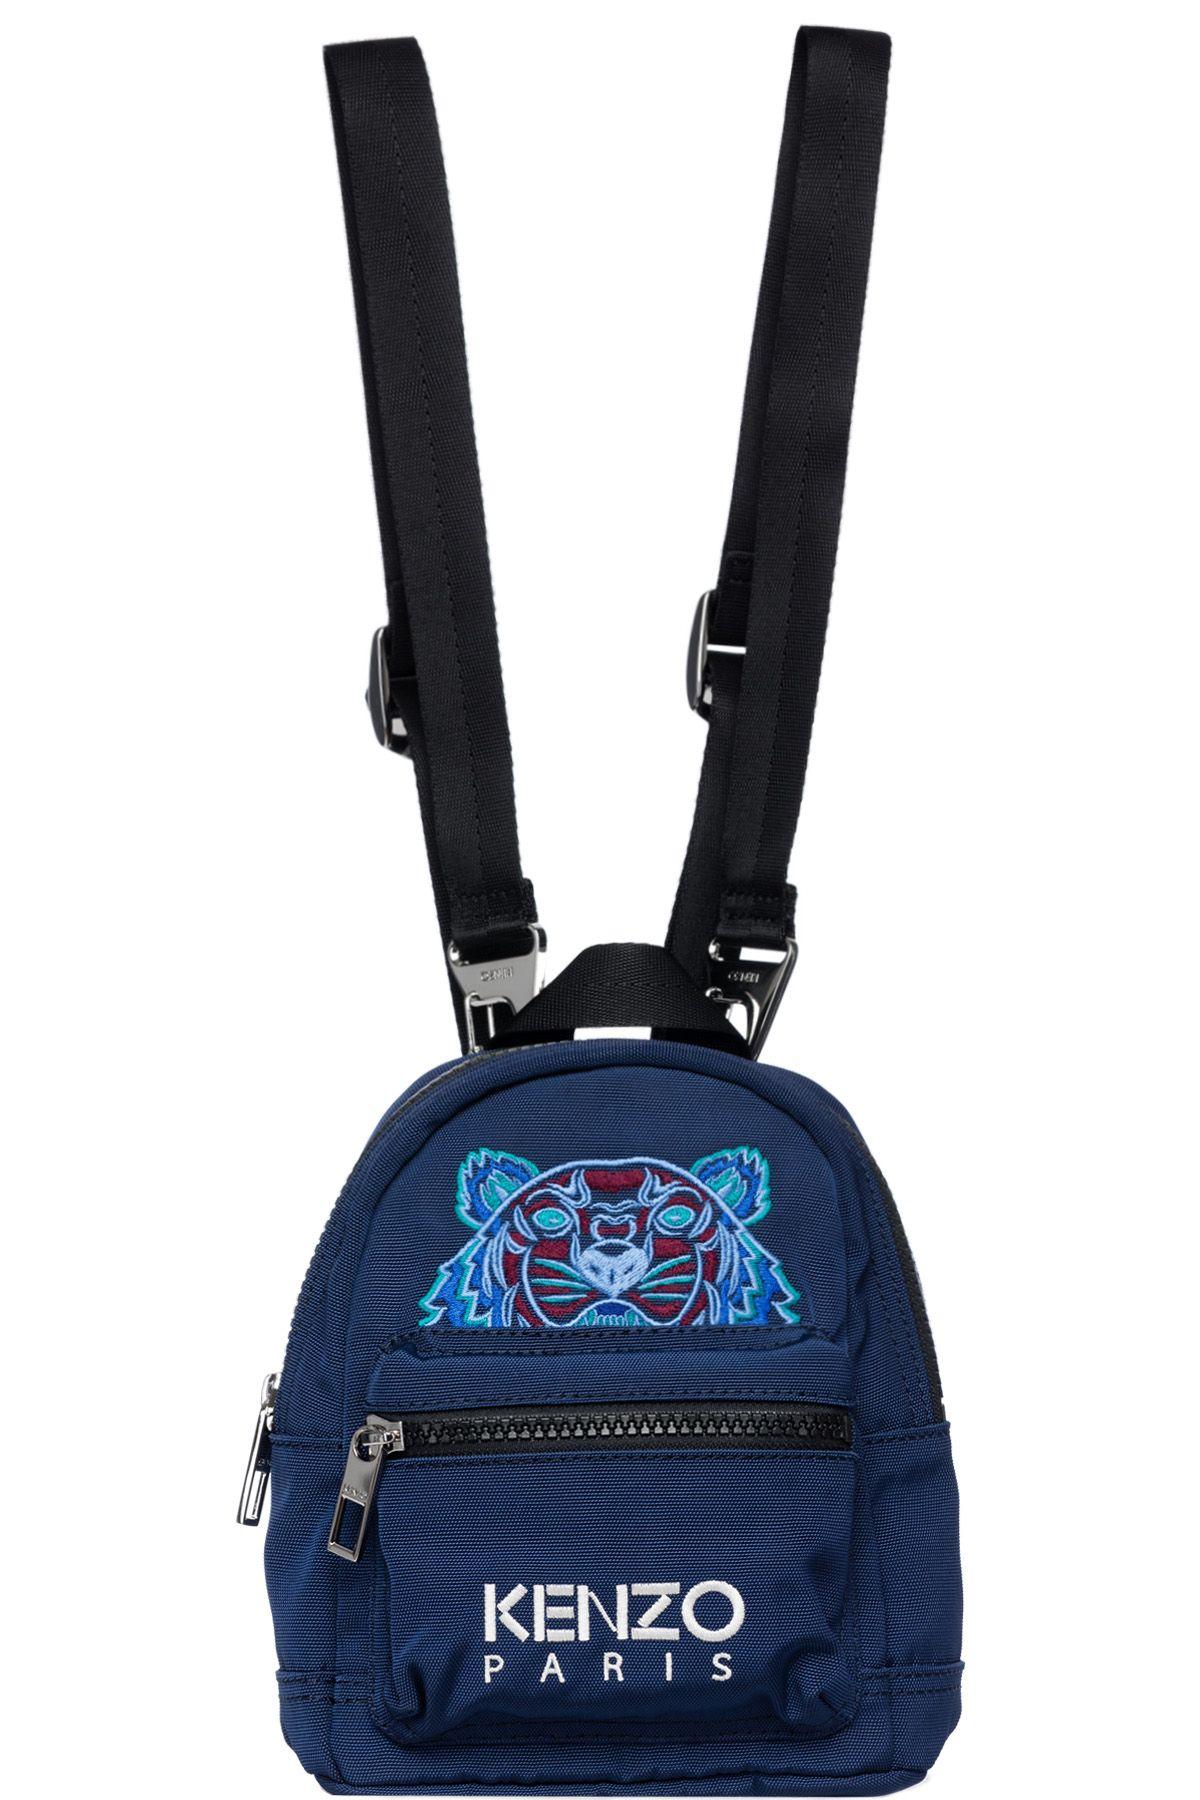 dc8c2429f4 Kenzo - Mini Tiger Canvas Backpacks - Navy Blue